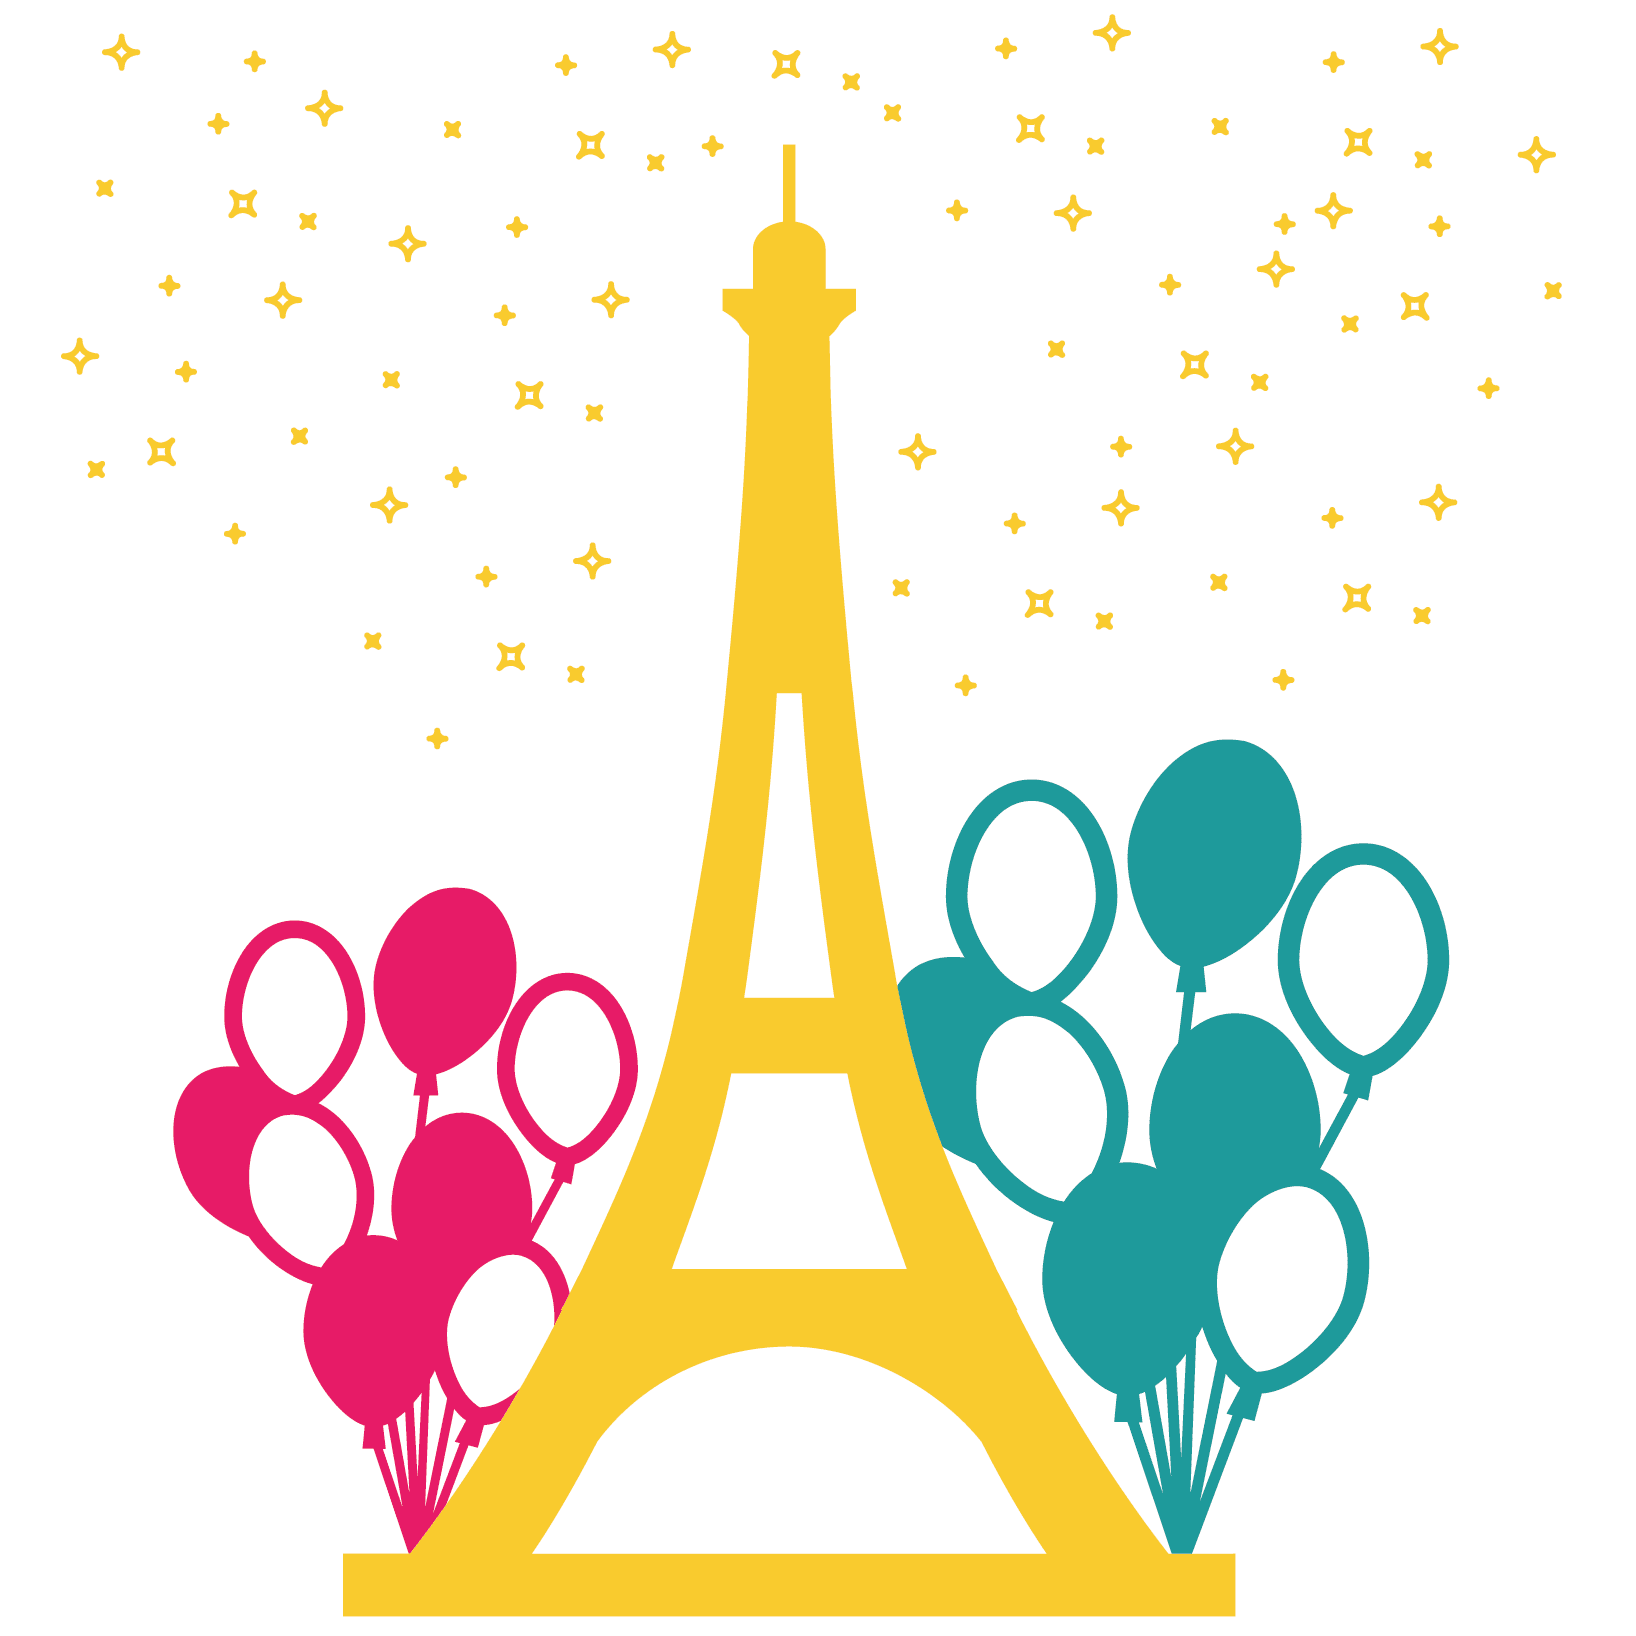 Anniversaire Enfant Paris 10 Idees Originales Pour Feter L Anniversaire De Son Enfant A Paris Le Magazine Funbooker